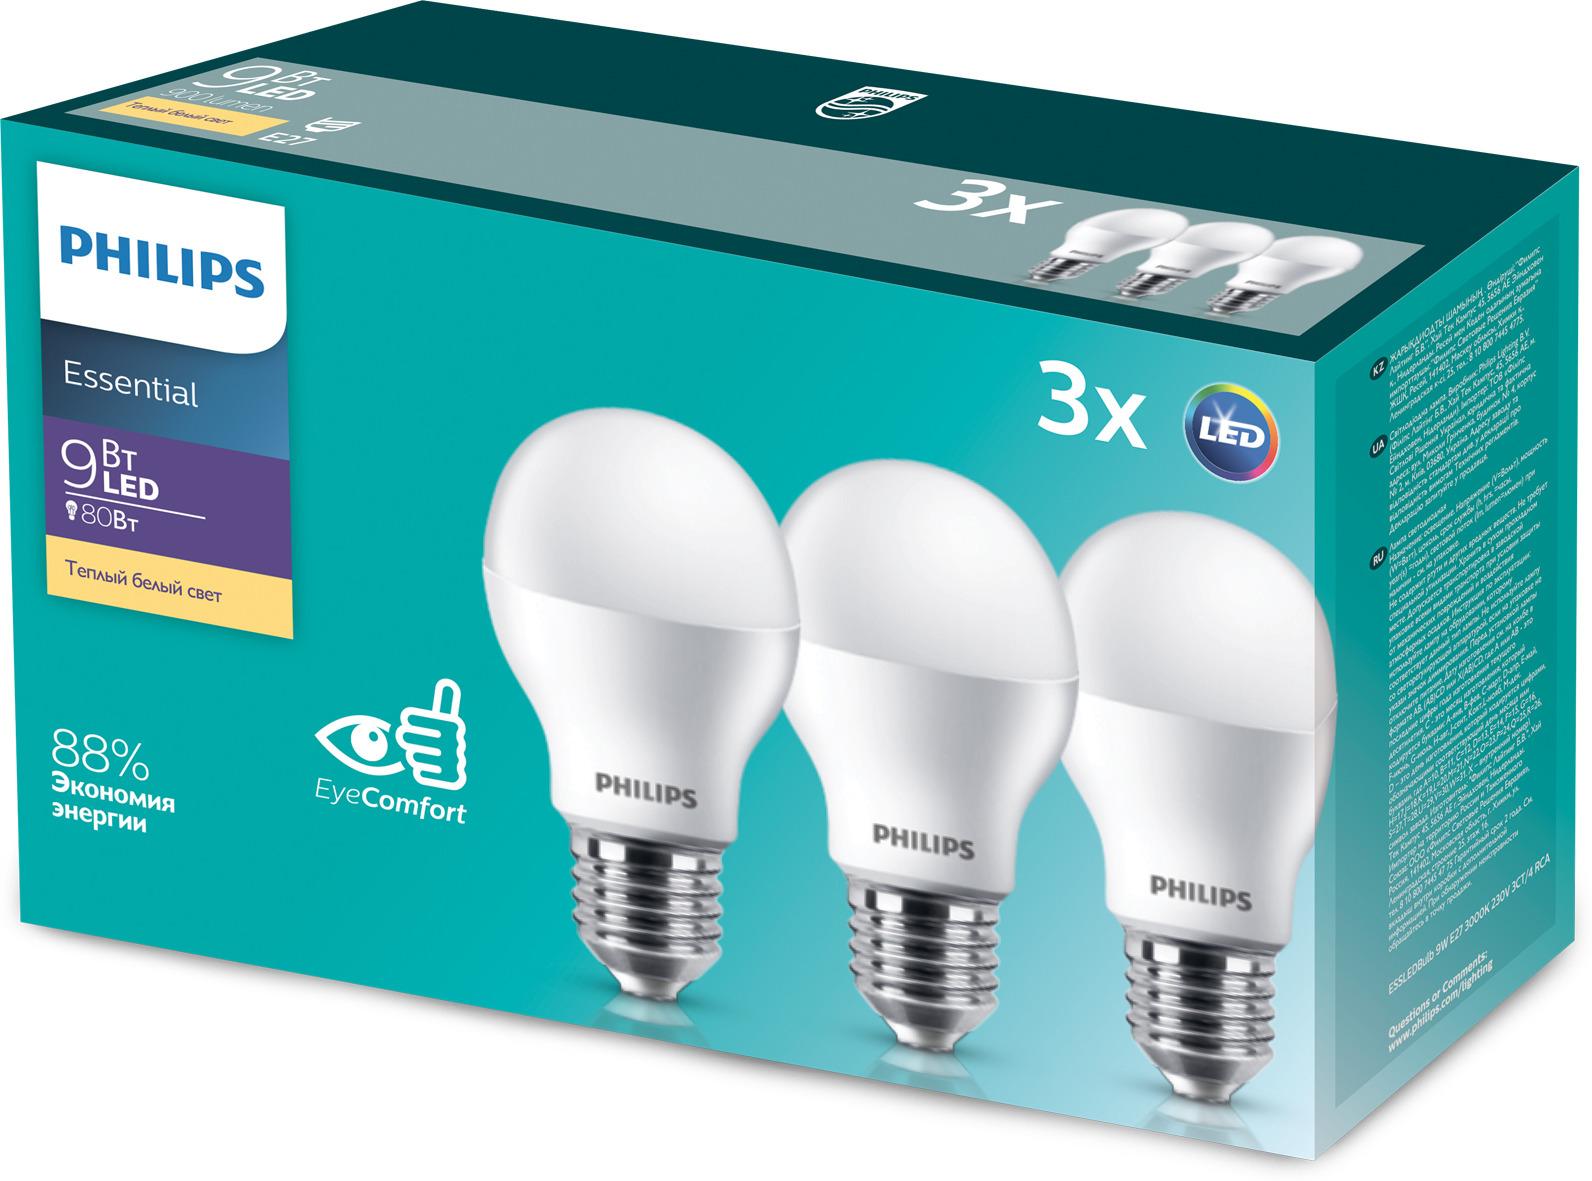 Лампочка Philips светодиодная Essential LEDBulb 9 Вт, Светодиодная лампочка philips 12v 10w20w35w50w